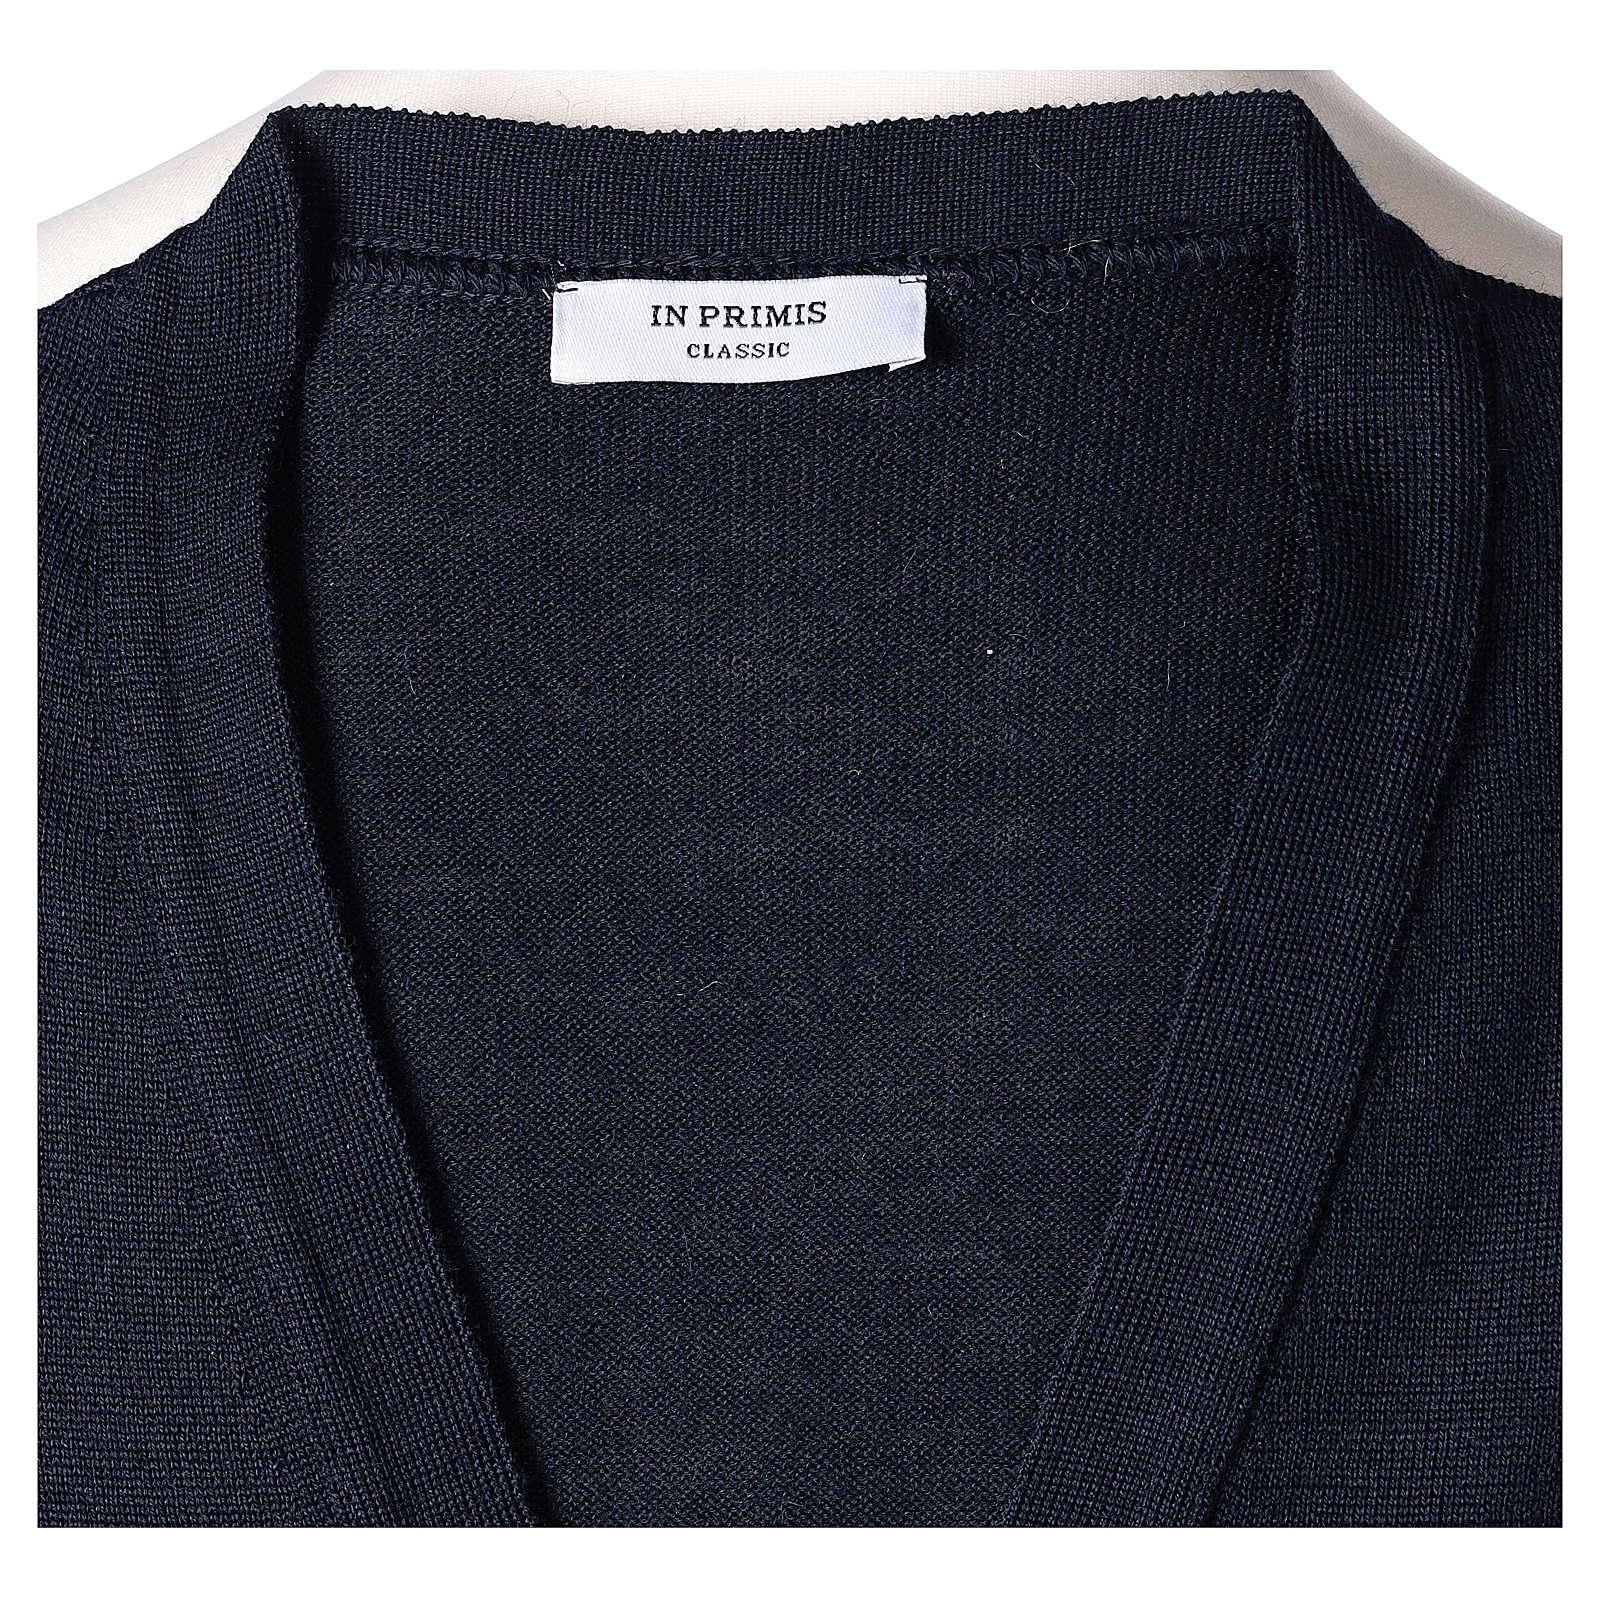 Gilet sacerdote aperto 50% lana merino 50% acrilico maglia rasata blu In Primis 4